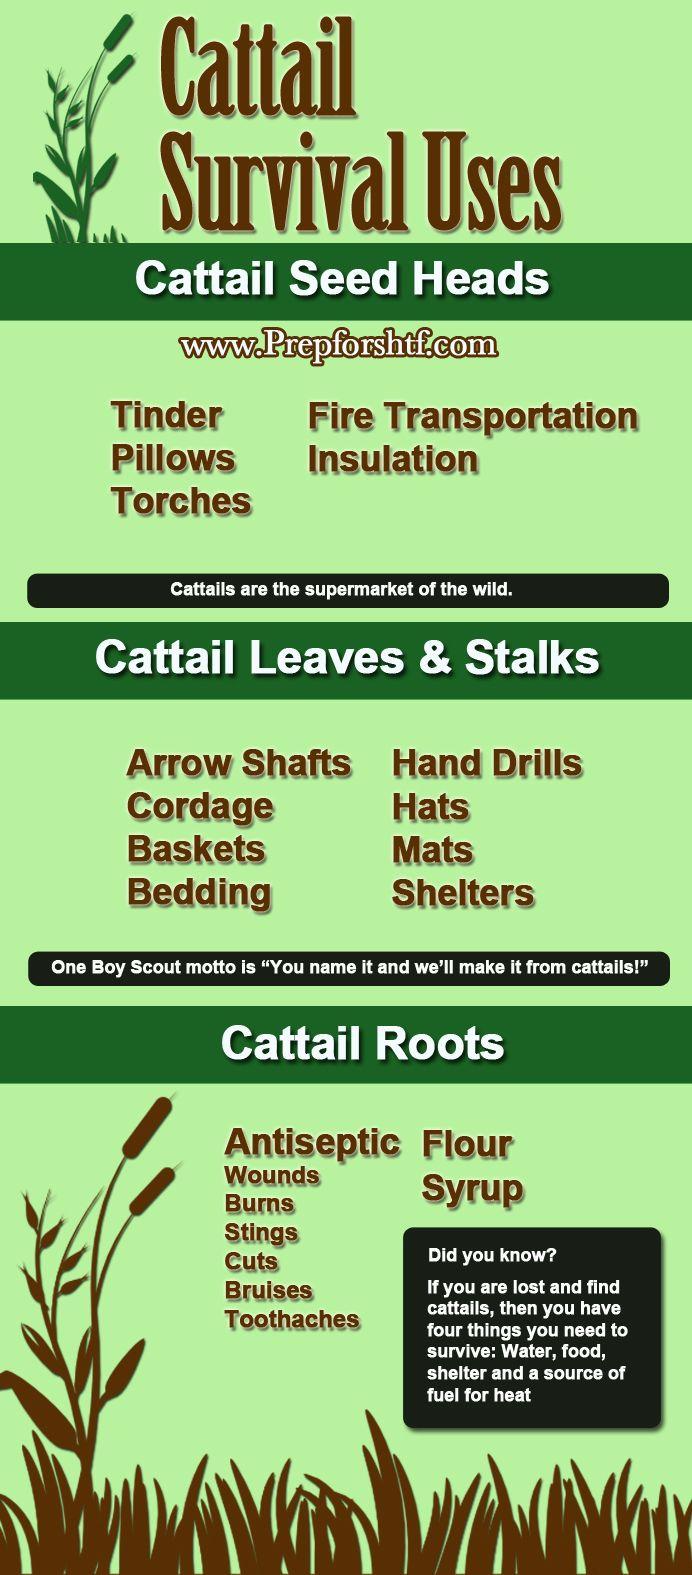 Cattail Survival Uses   Survival Prepping Ideas, Survival Gear, Skills & Emergency Preparedness Tips - Survival Life Blog: survivallife.com #survivallife